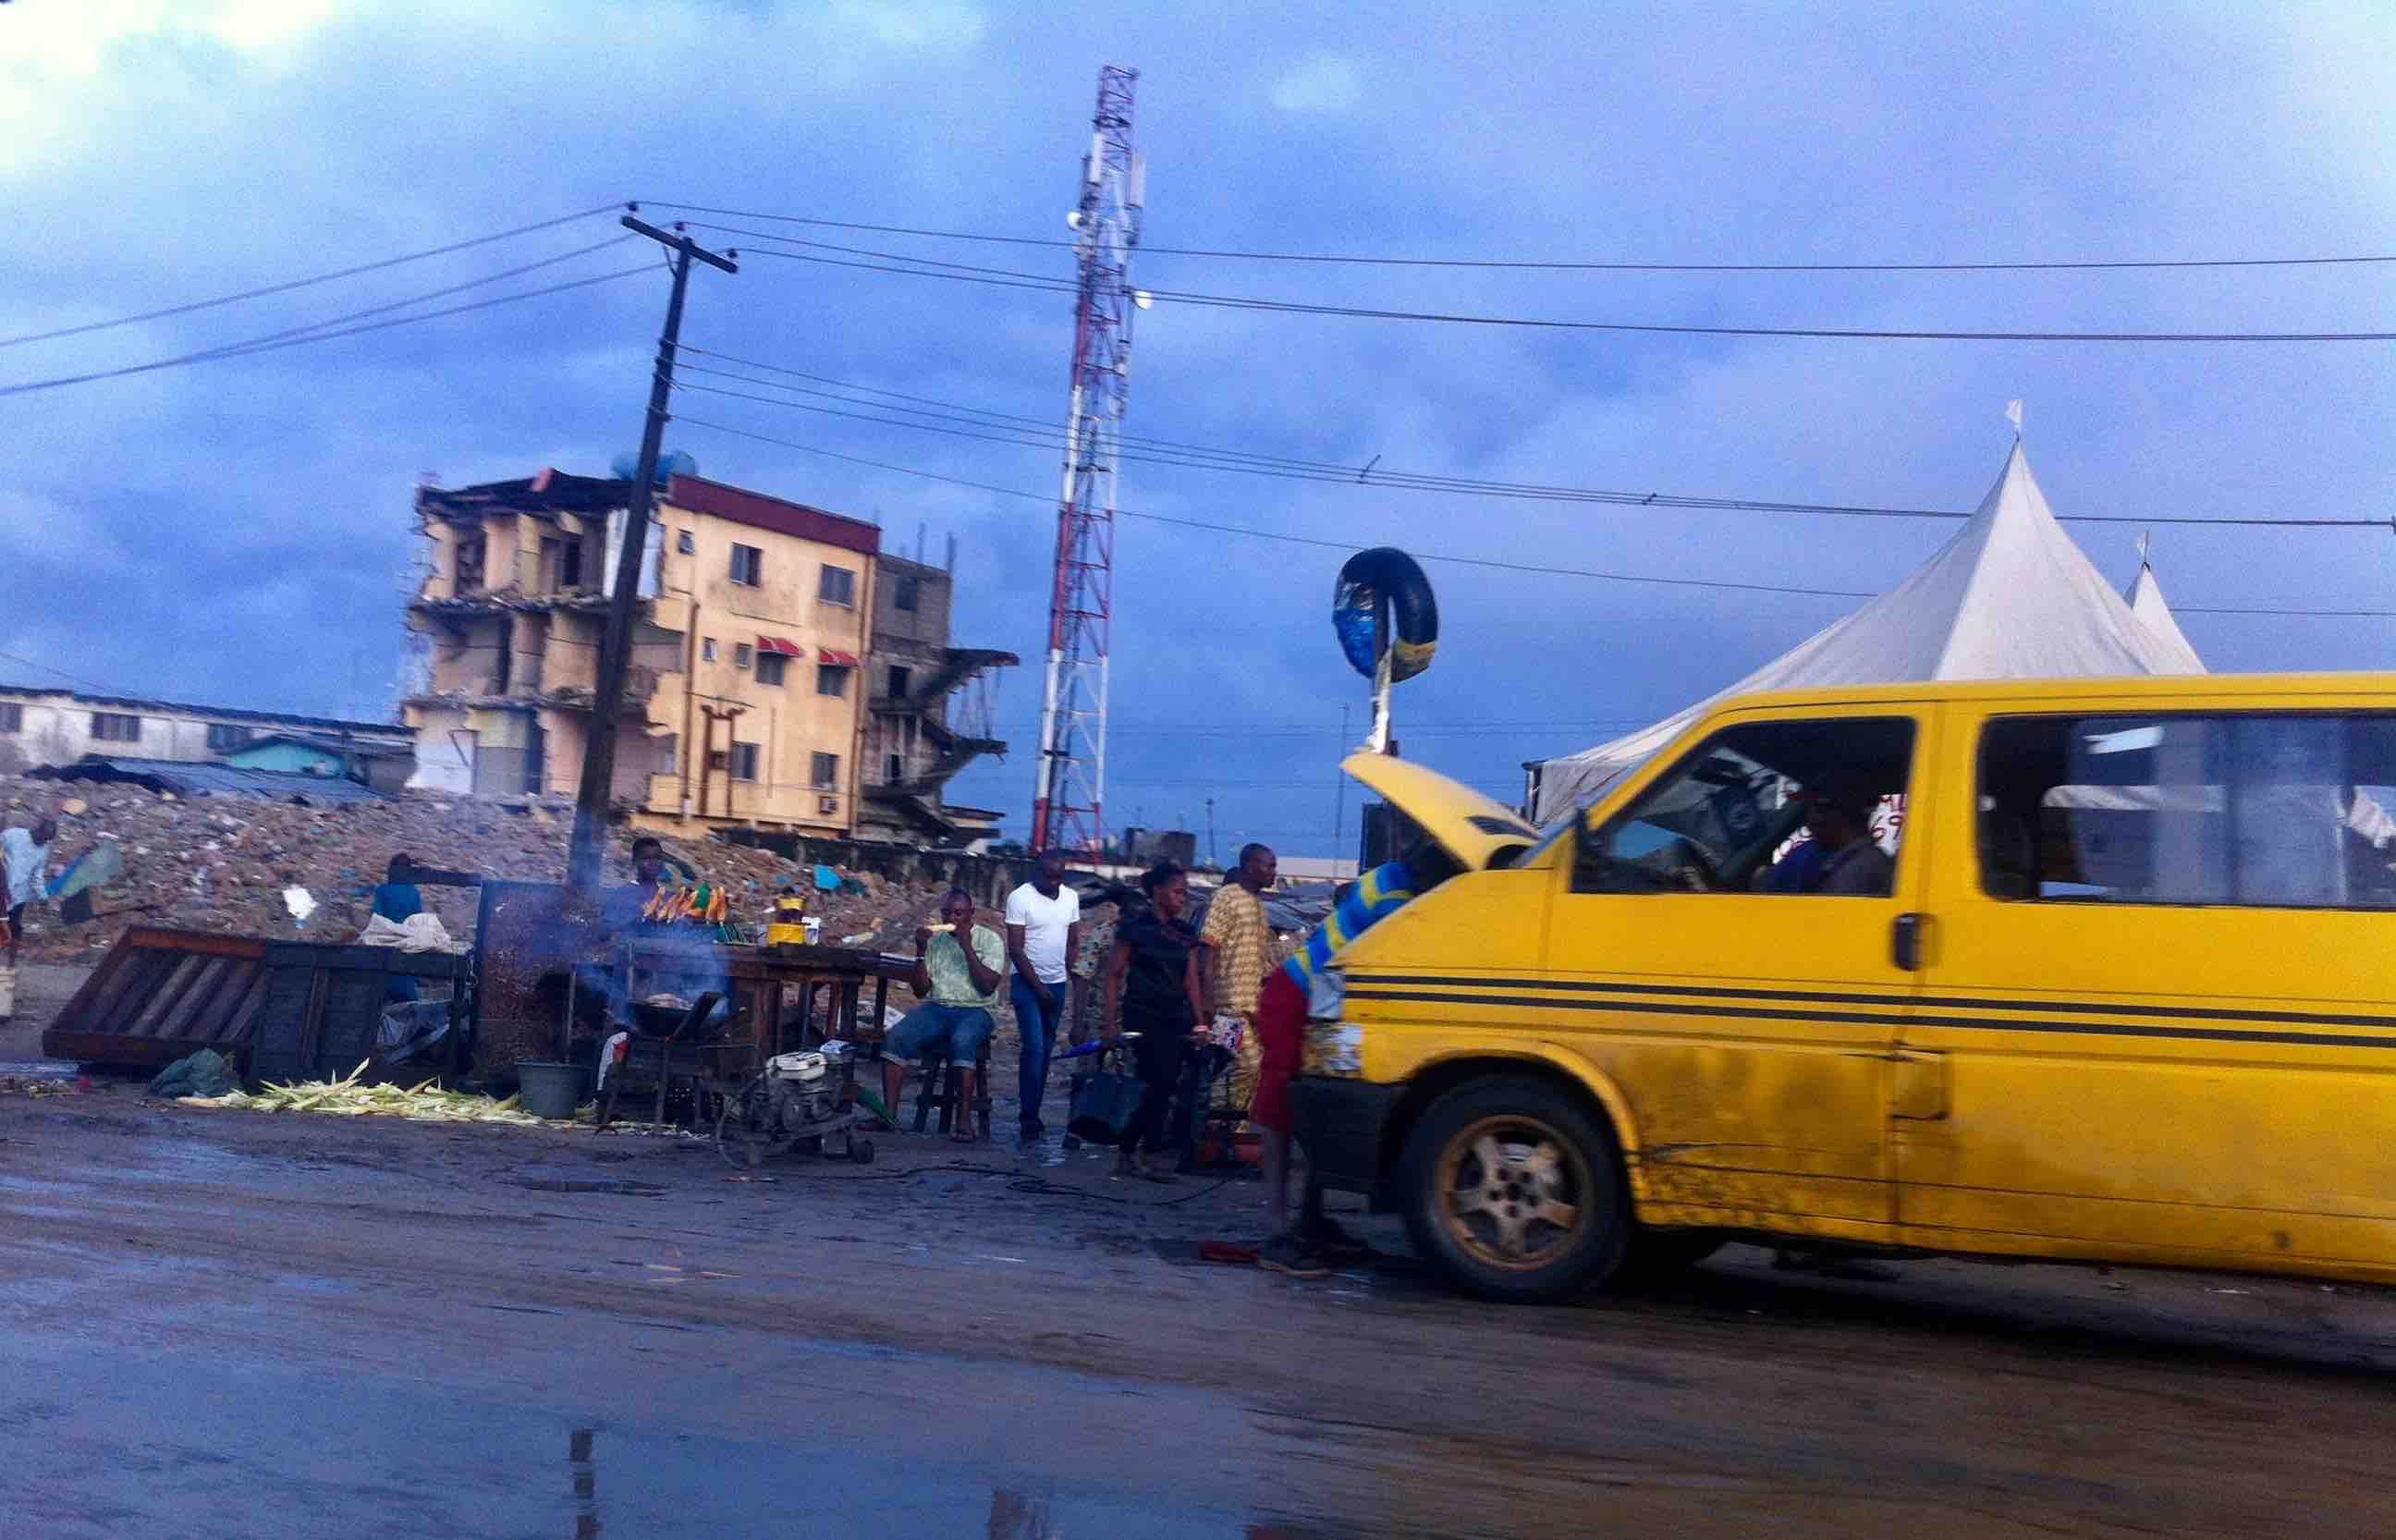 Street Food, Roast Corn, Lagos - Badagry Expressway, Lagos State, Nigeria. #JujuFilms